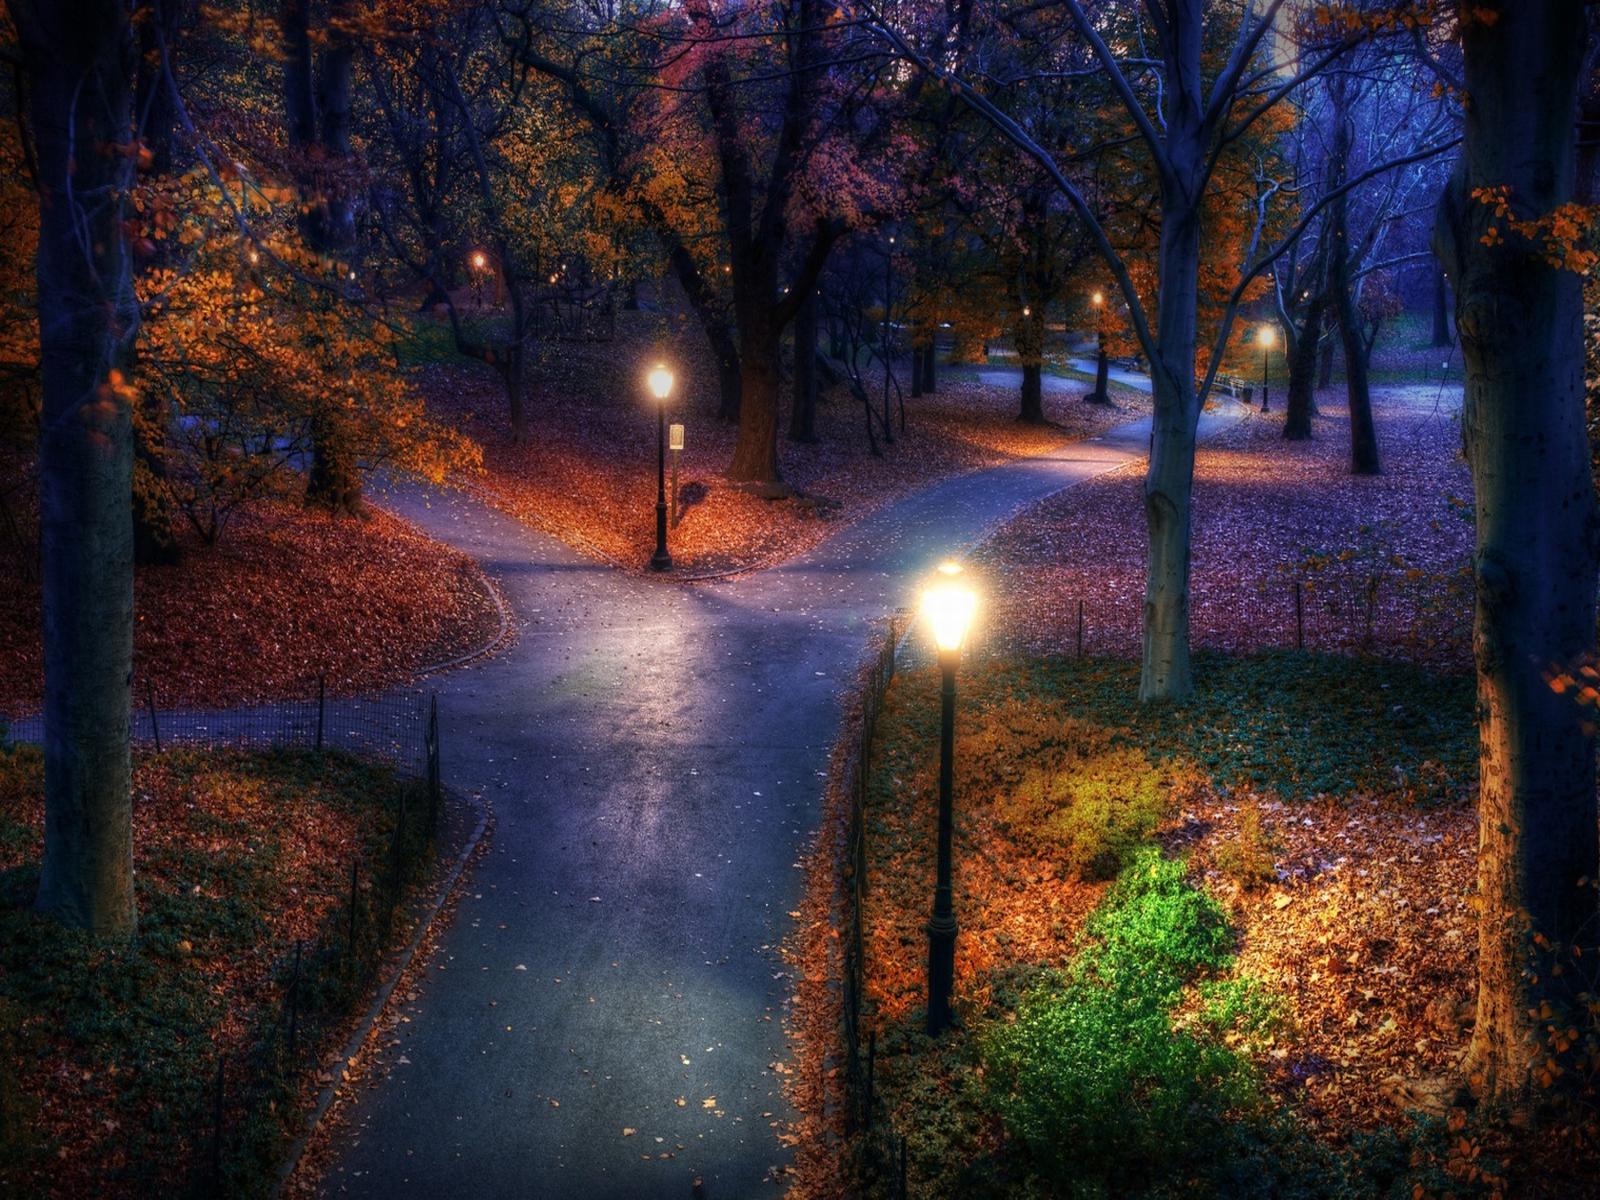 Autumn in the Park - Autumn Wallpaper (25517309) - Fanpop fanclubs